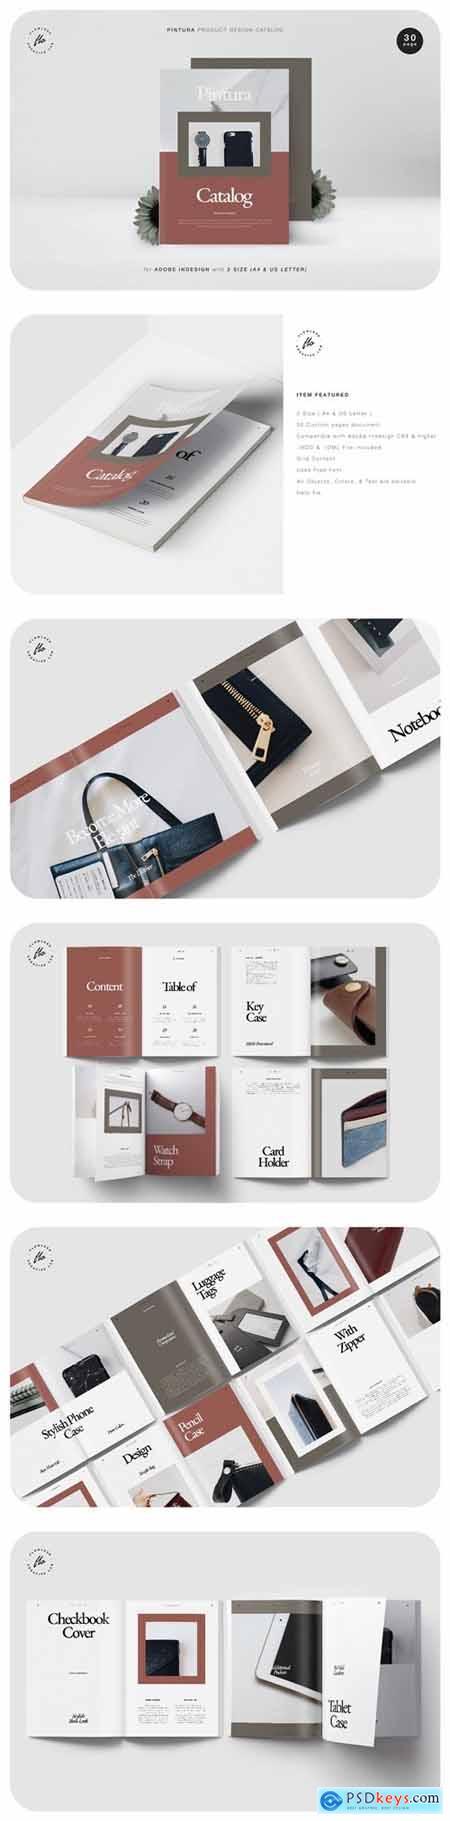 Pintura Product Design Catalog